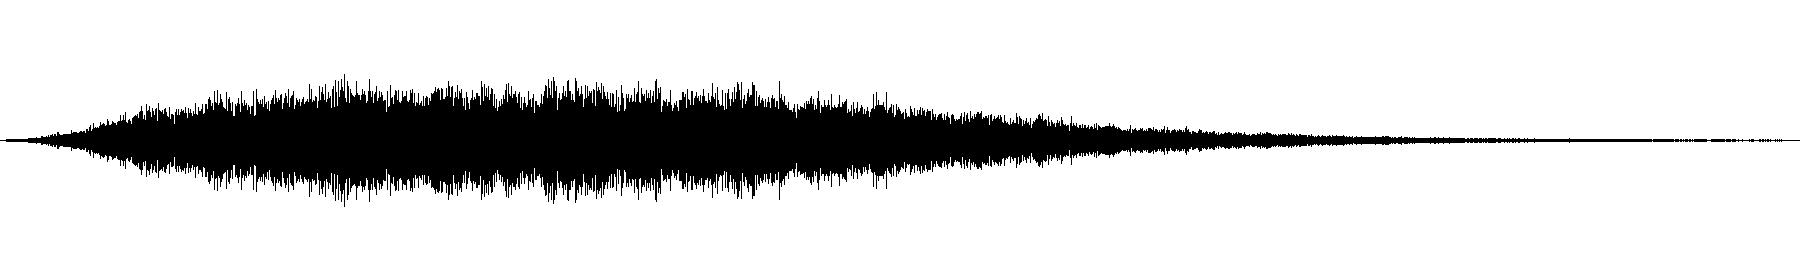 synth choir c6